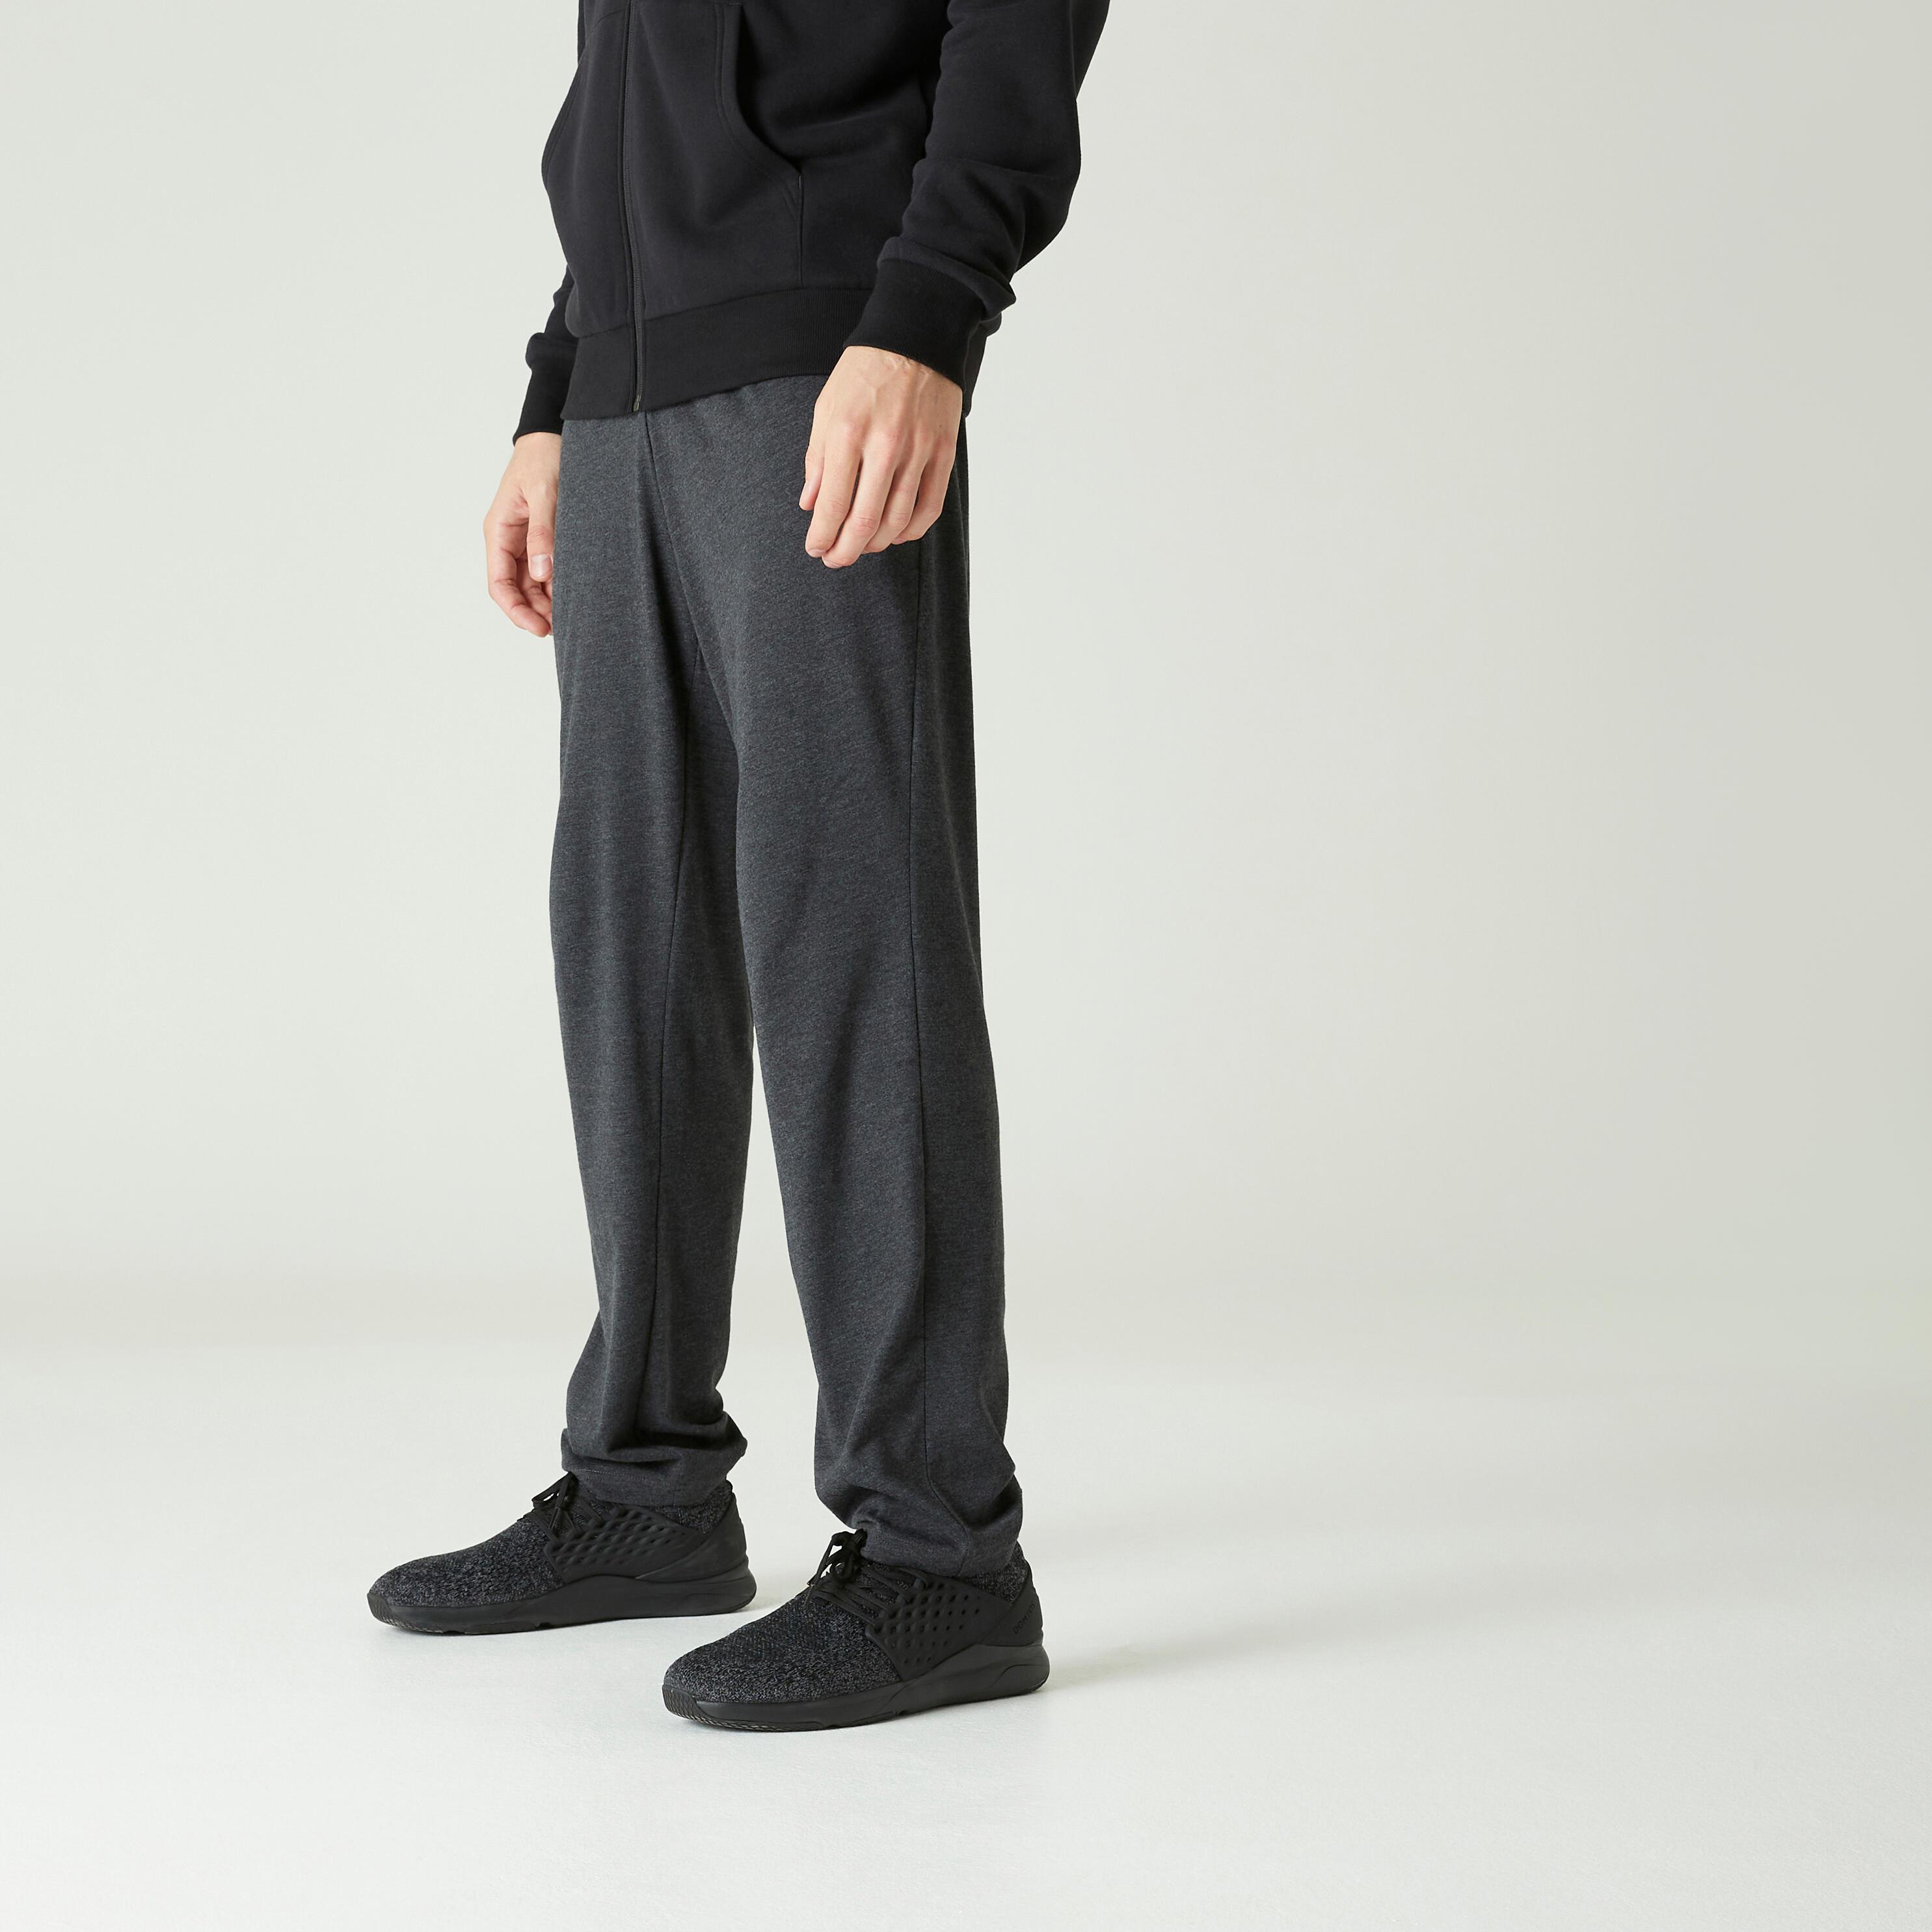 Pantalon regular 100 bărbați imagine